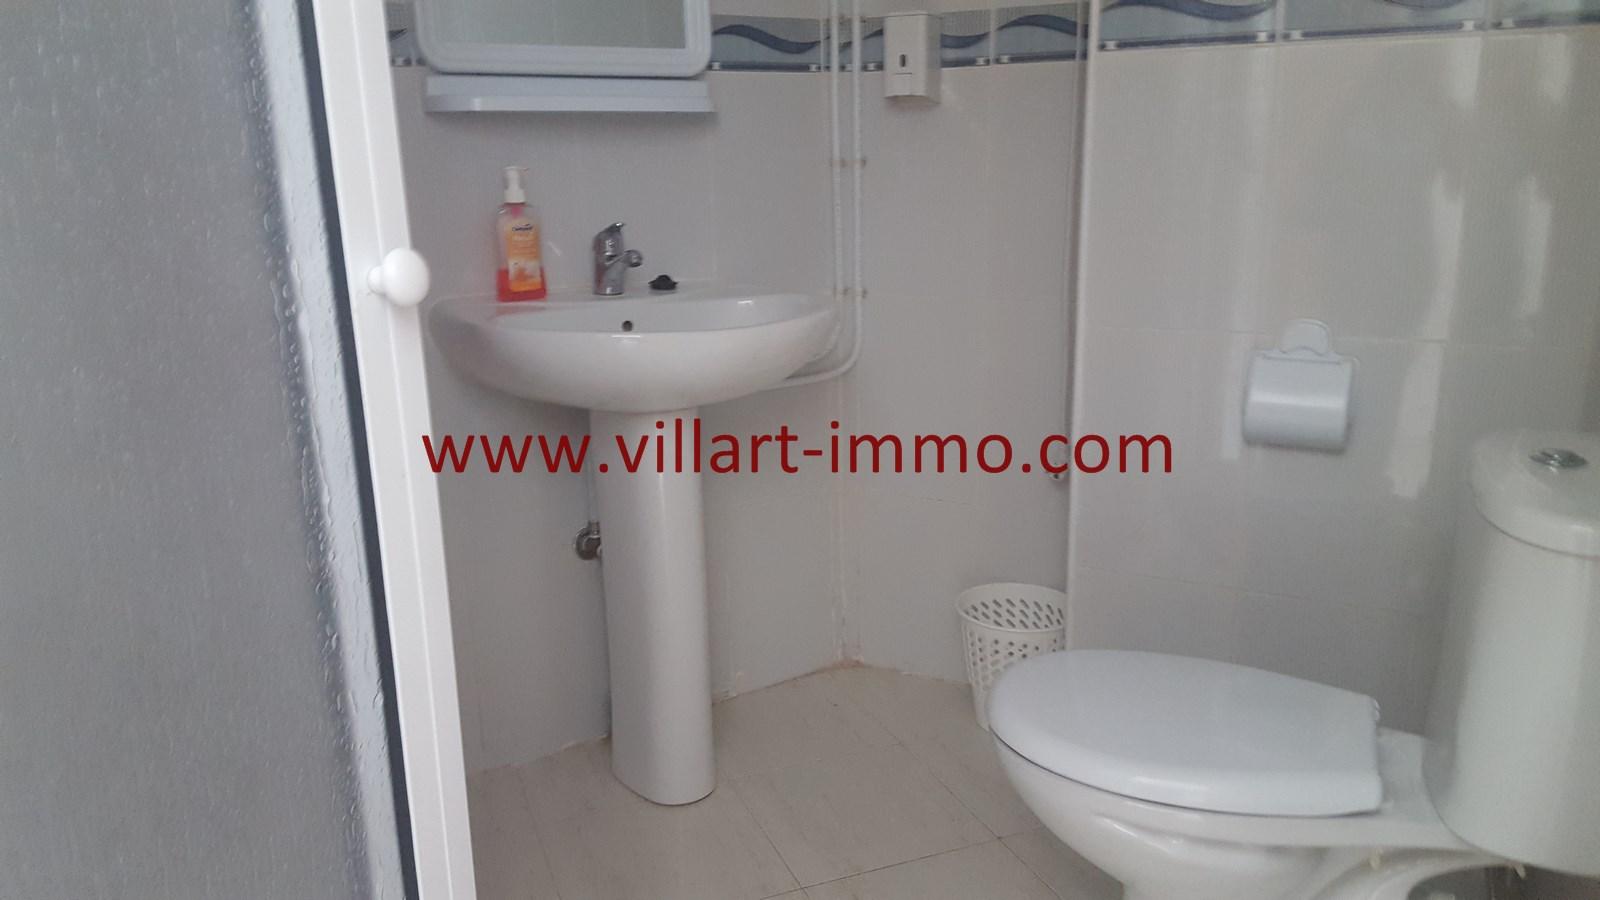 9-Vente-Appartement-Assilah-Salle de bain-VA508-Villart Immo